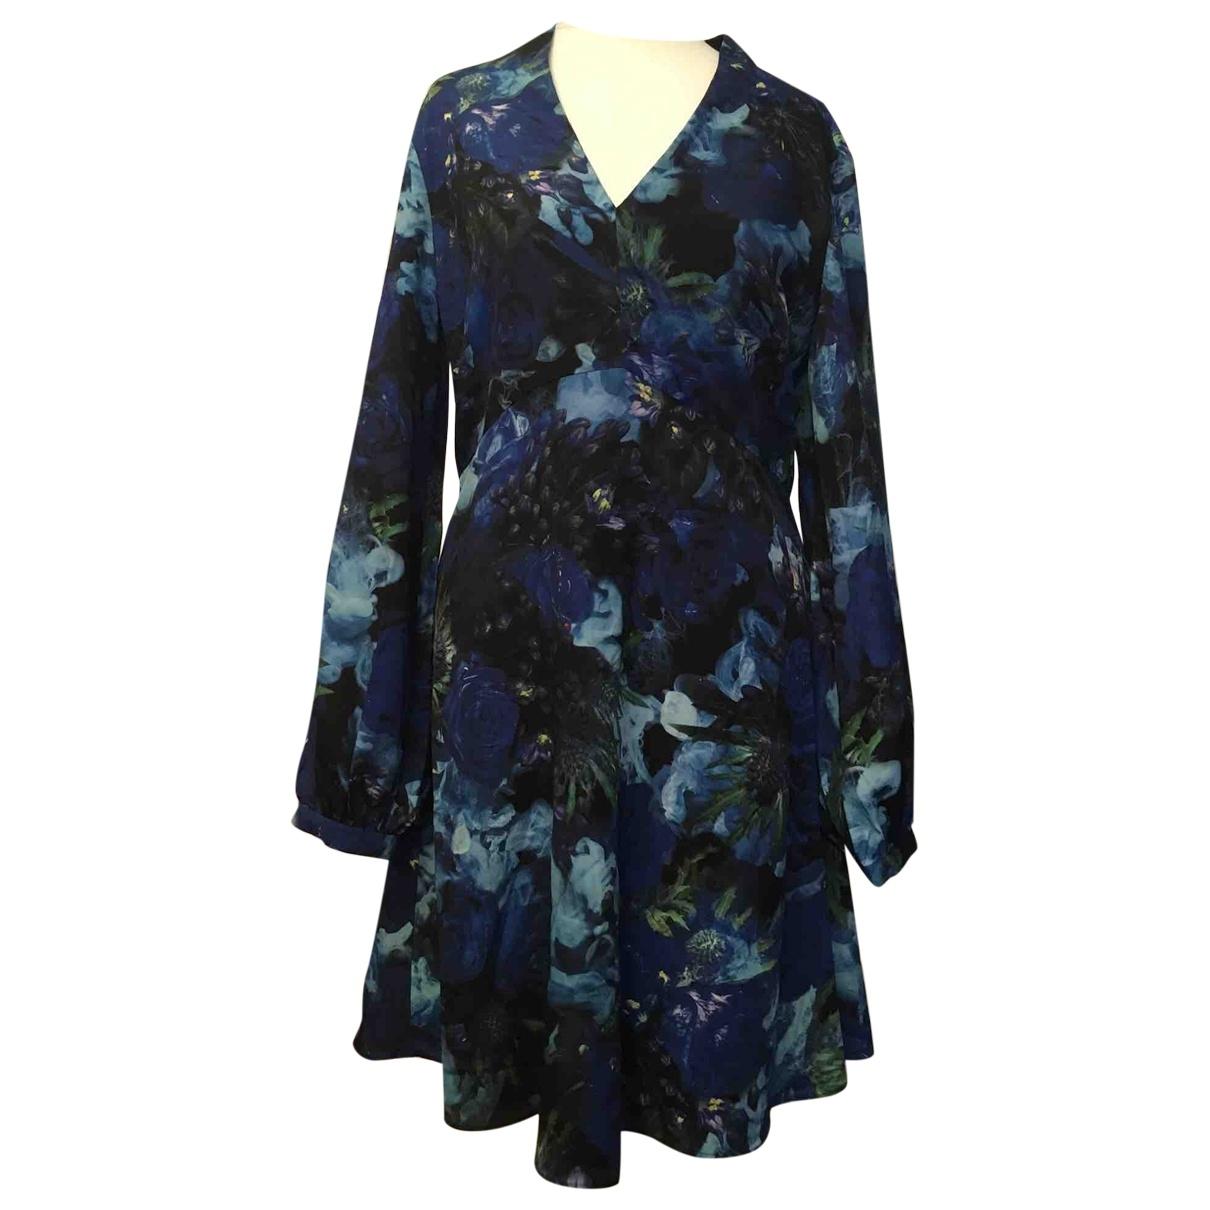 Needle & Thread \N Blue dress for Women 10 UK